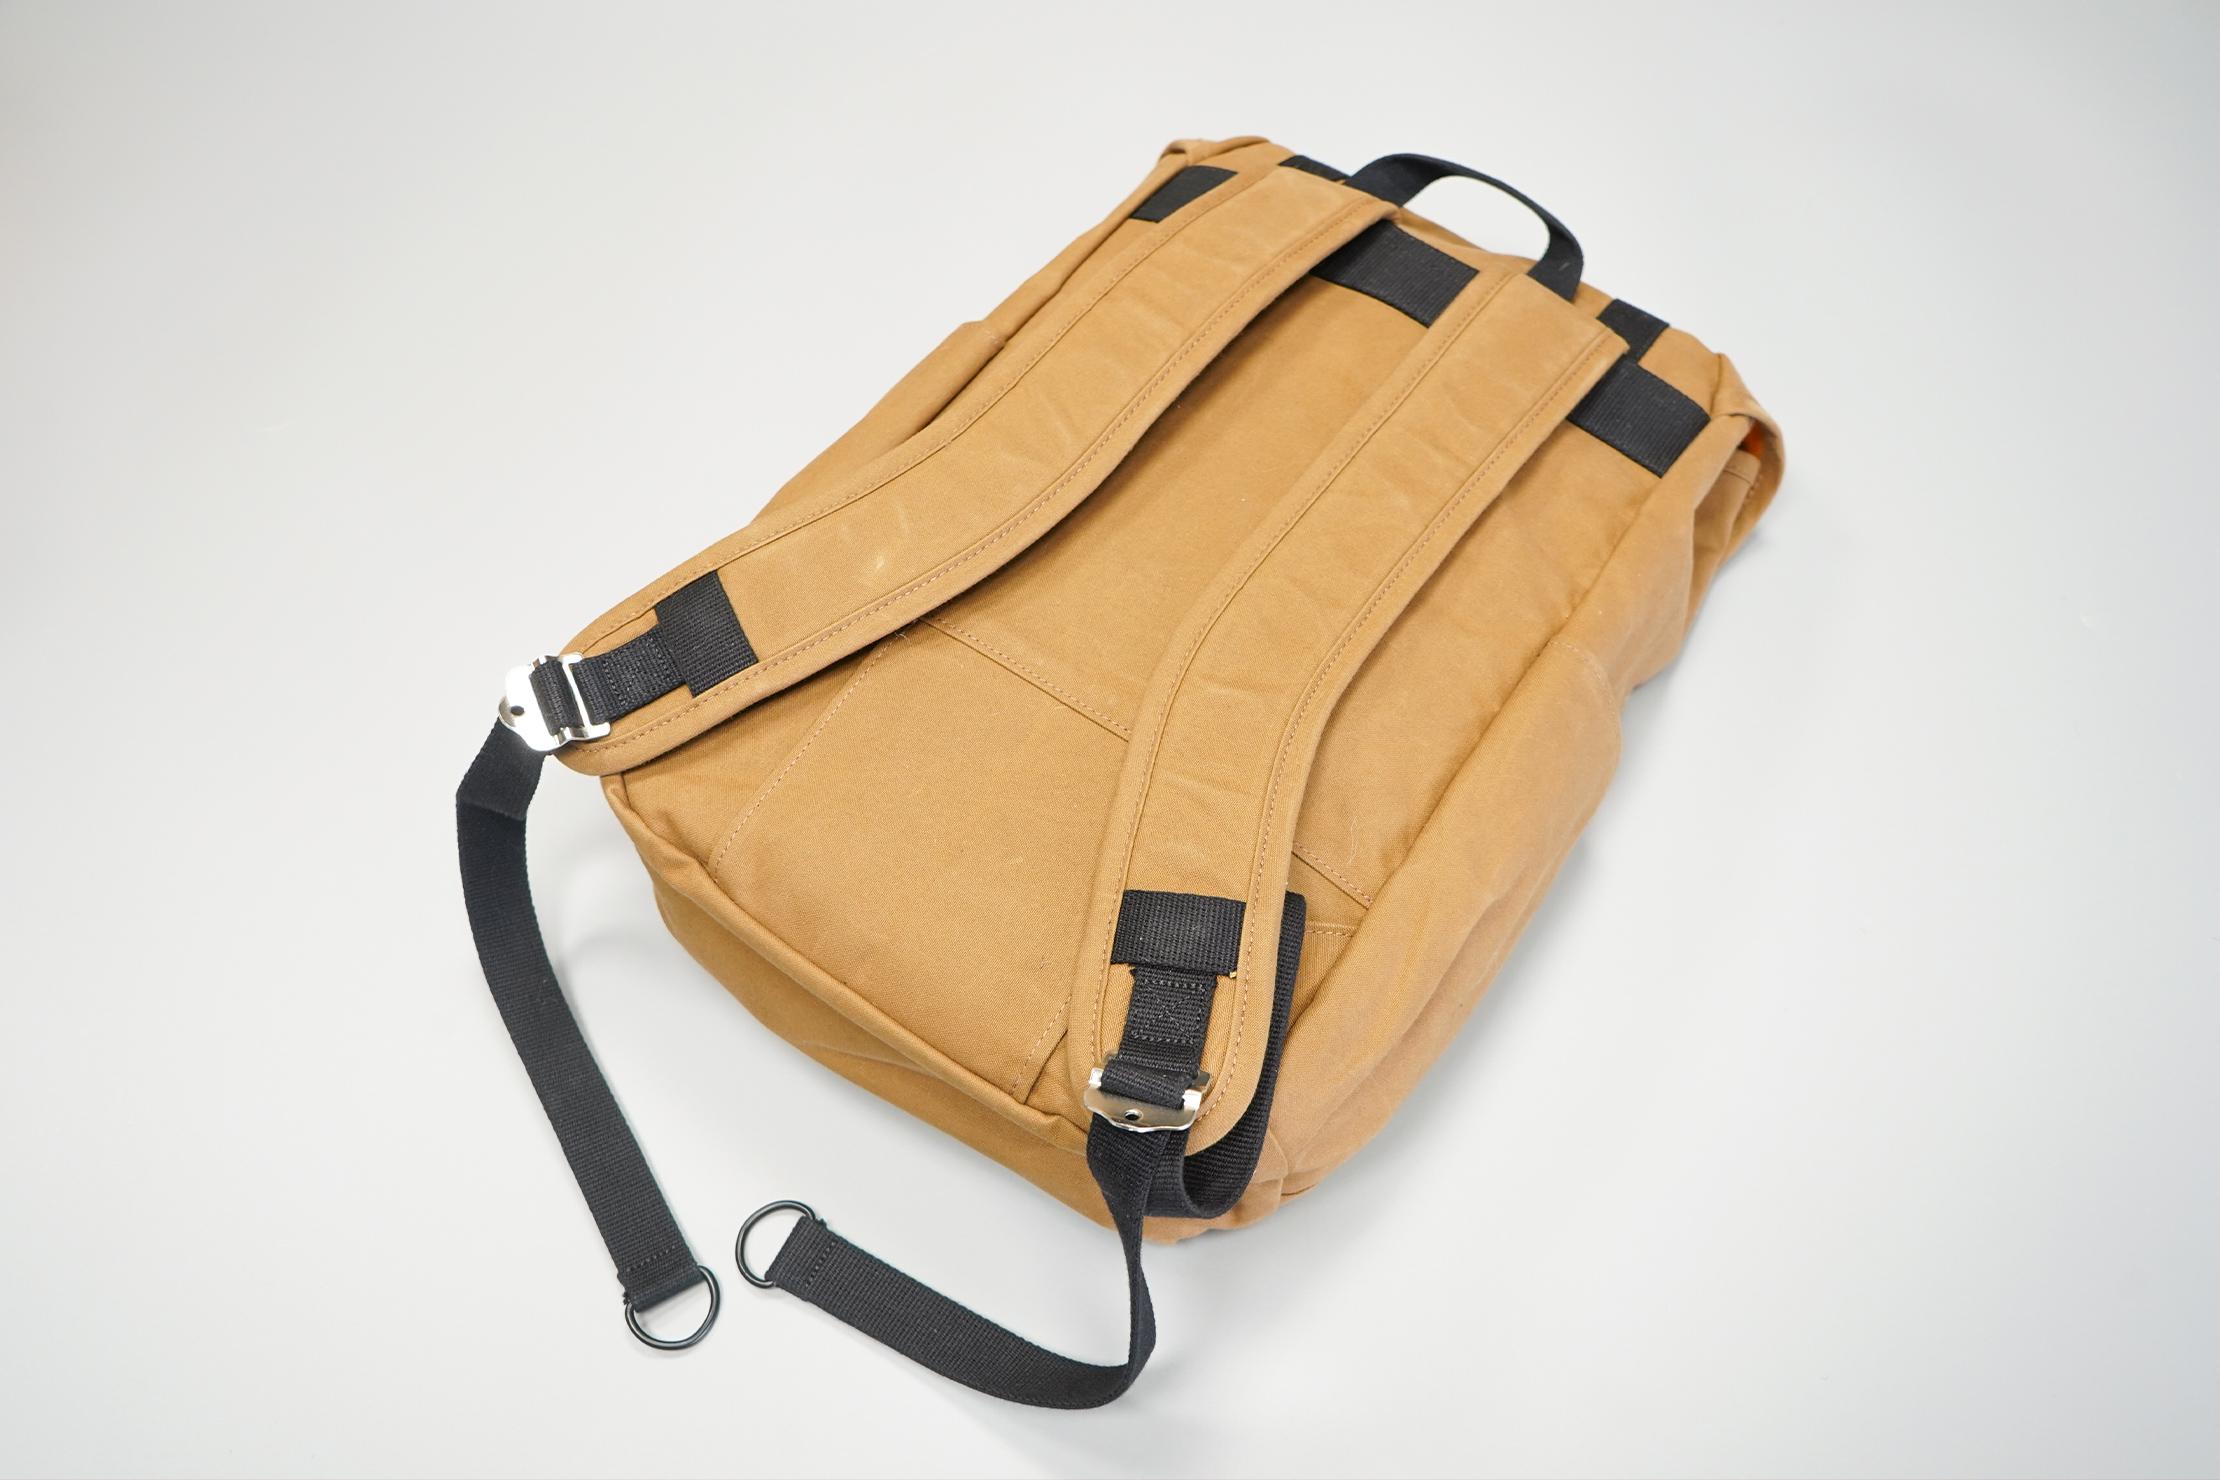 Trakke Bannoch | It's a simple harness system, but it works